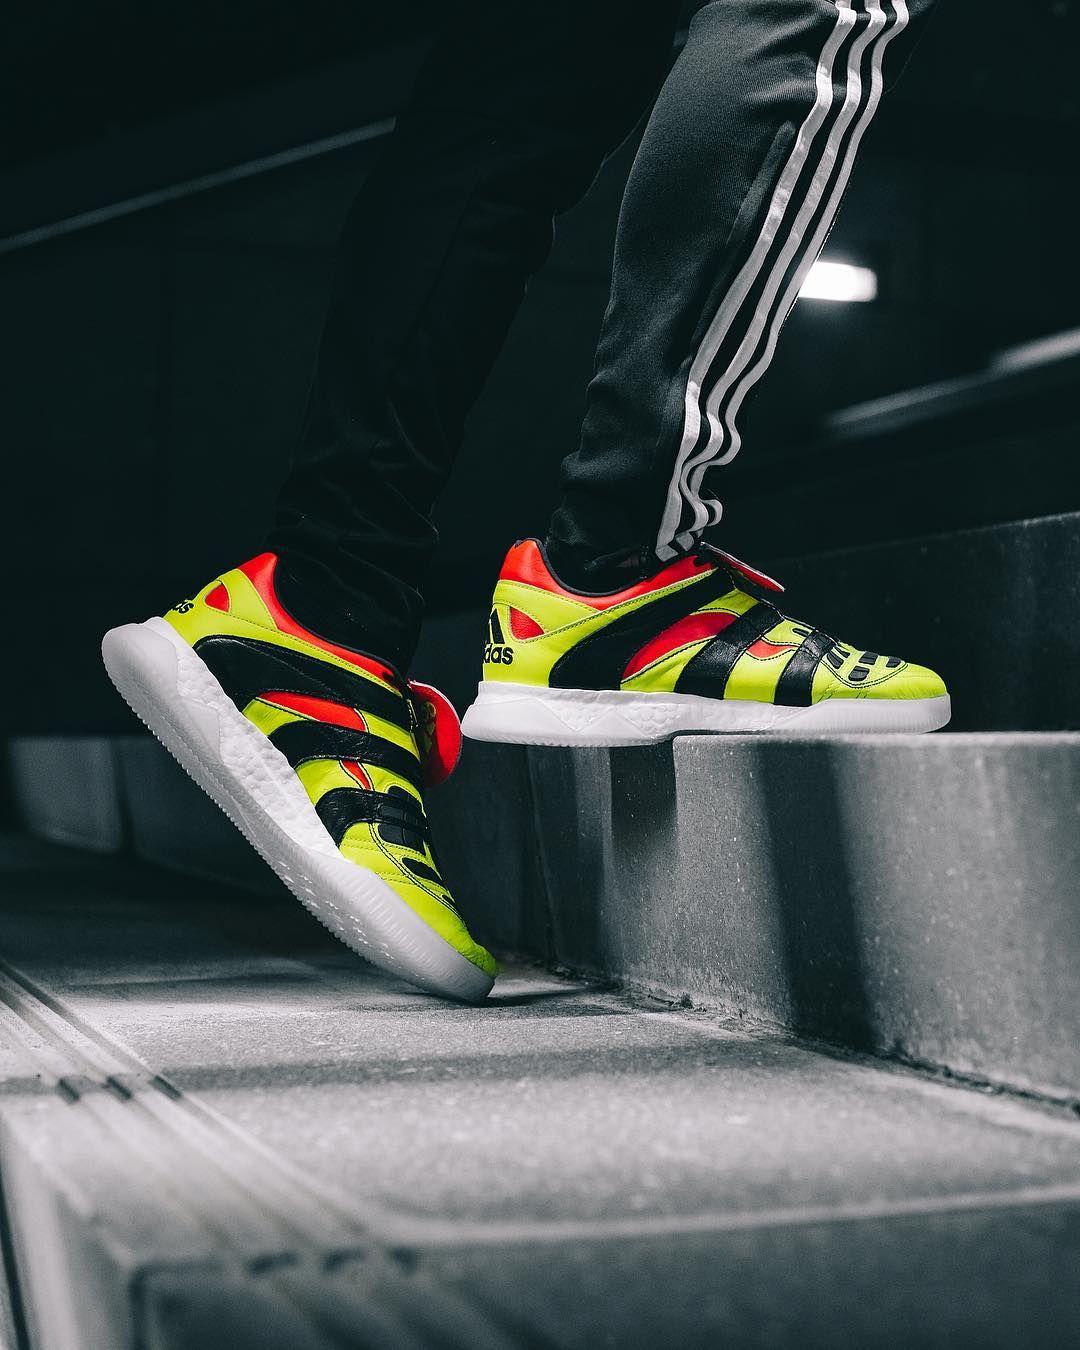 eba8942d09e Adidas Predator Accelerator Electricity remake FG.